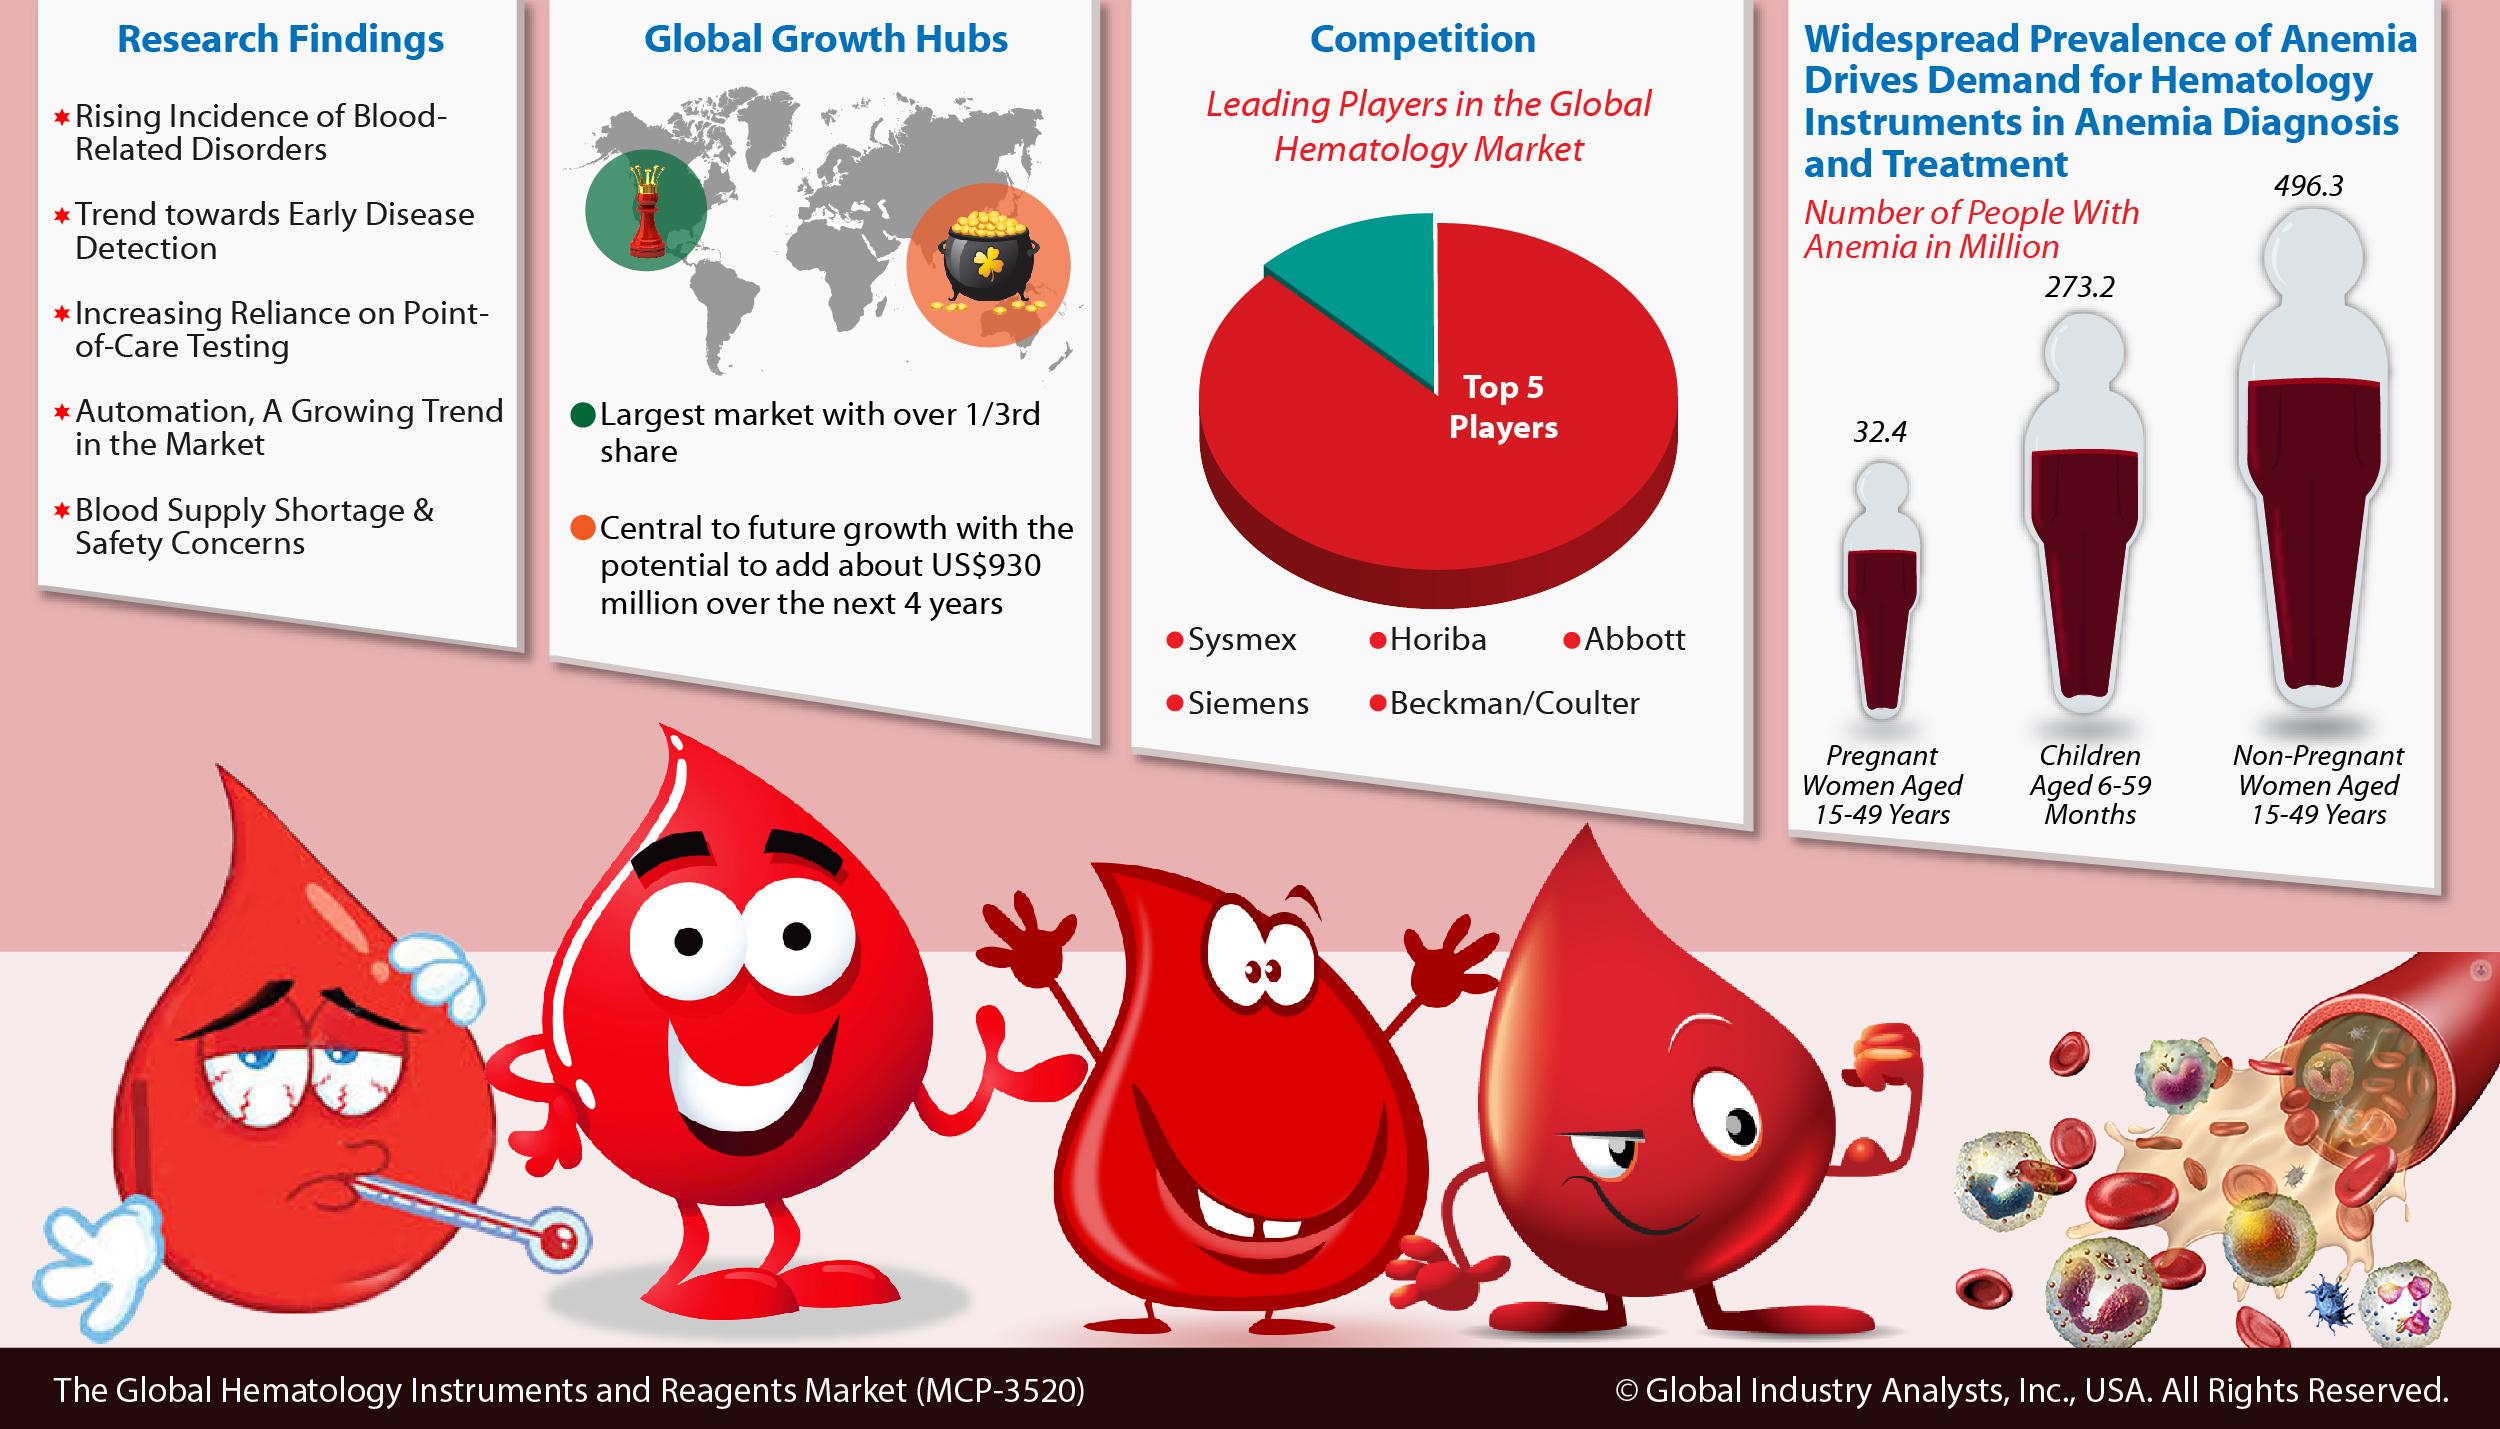 Hematology Instruments and Reagents Market Trends, Market